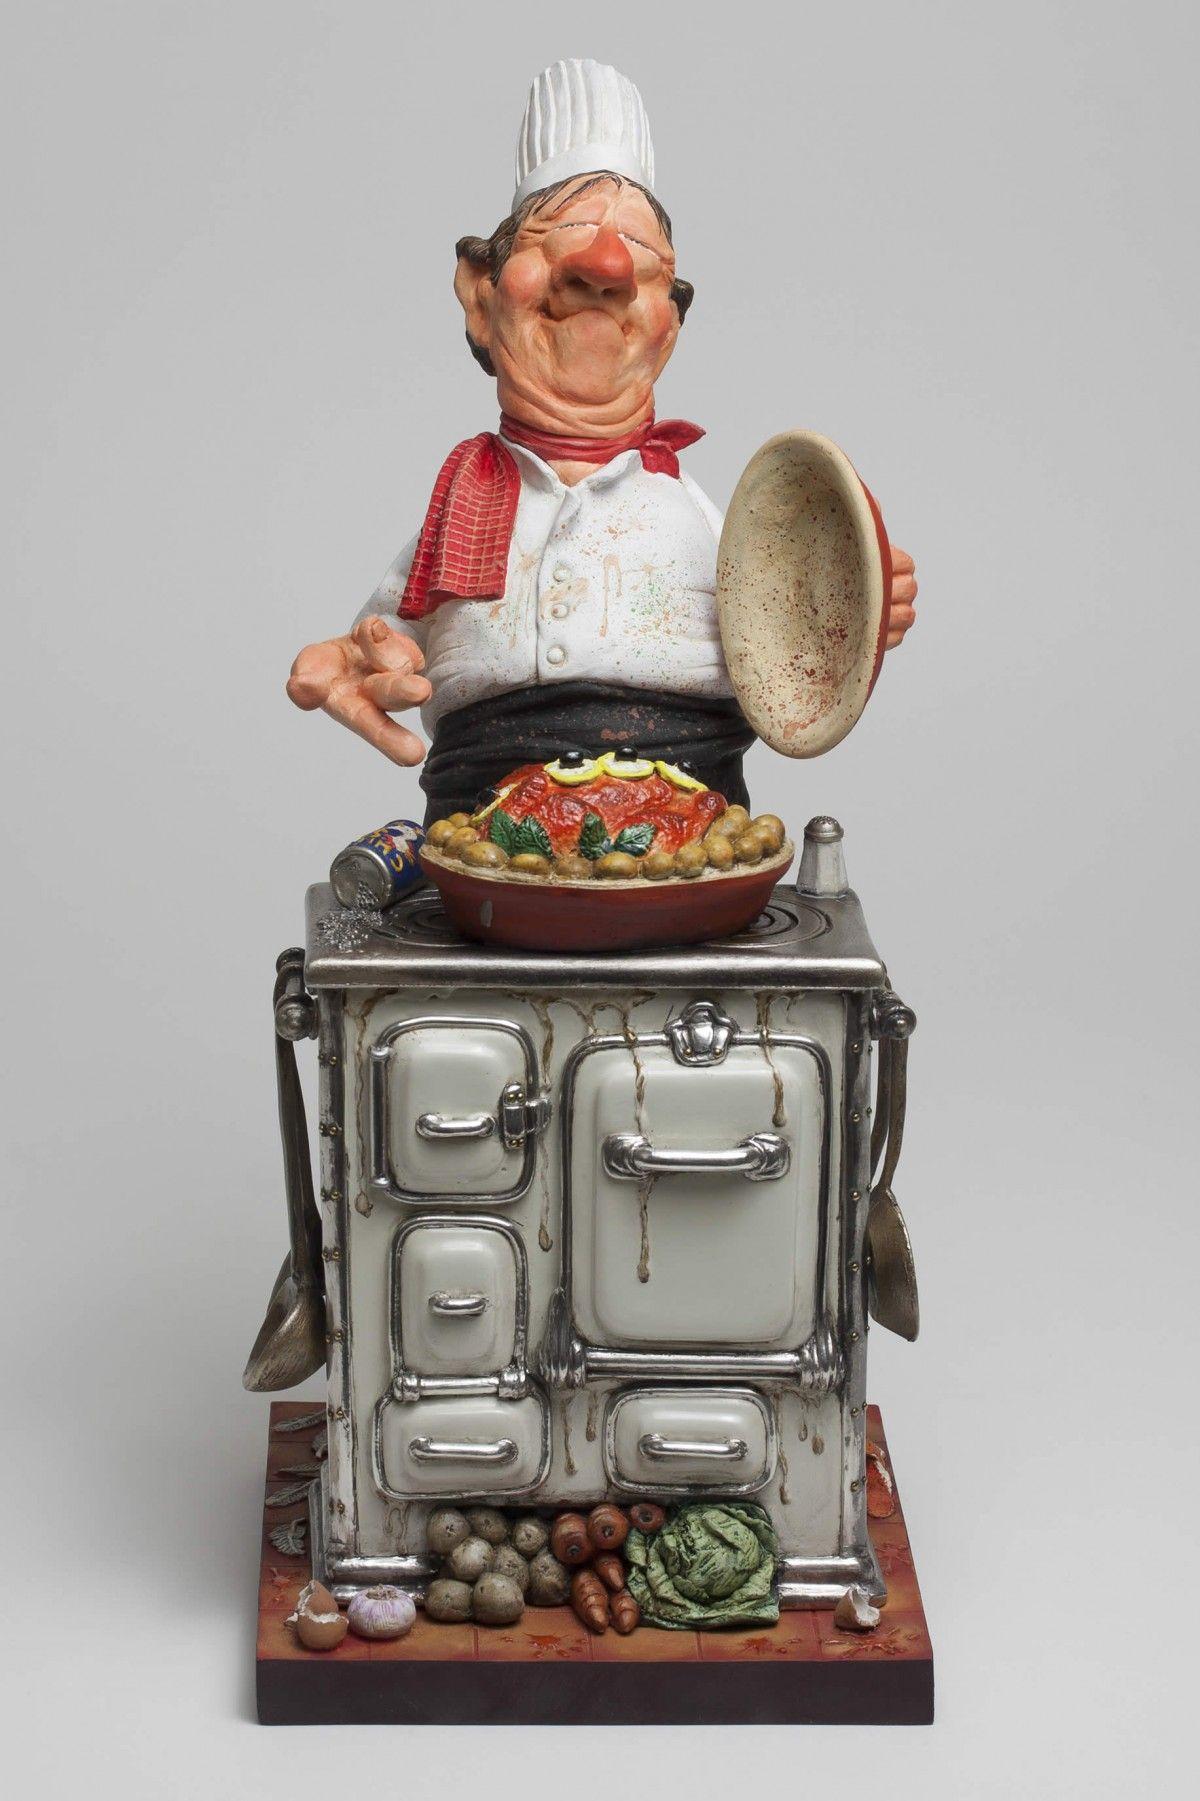 figura para decorar le master chef el masterchef the master chef